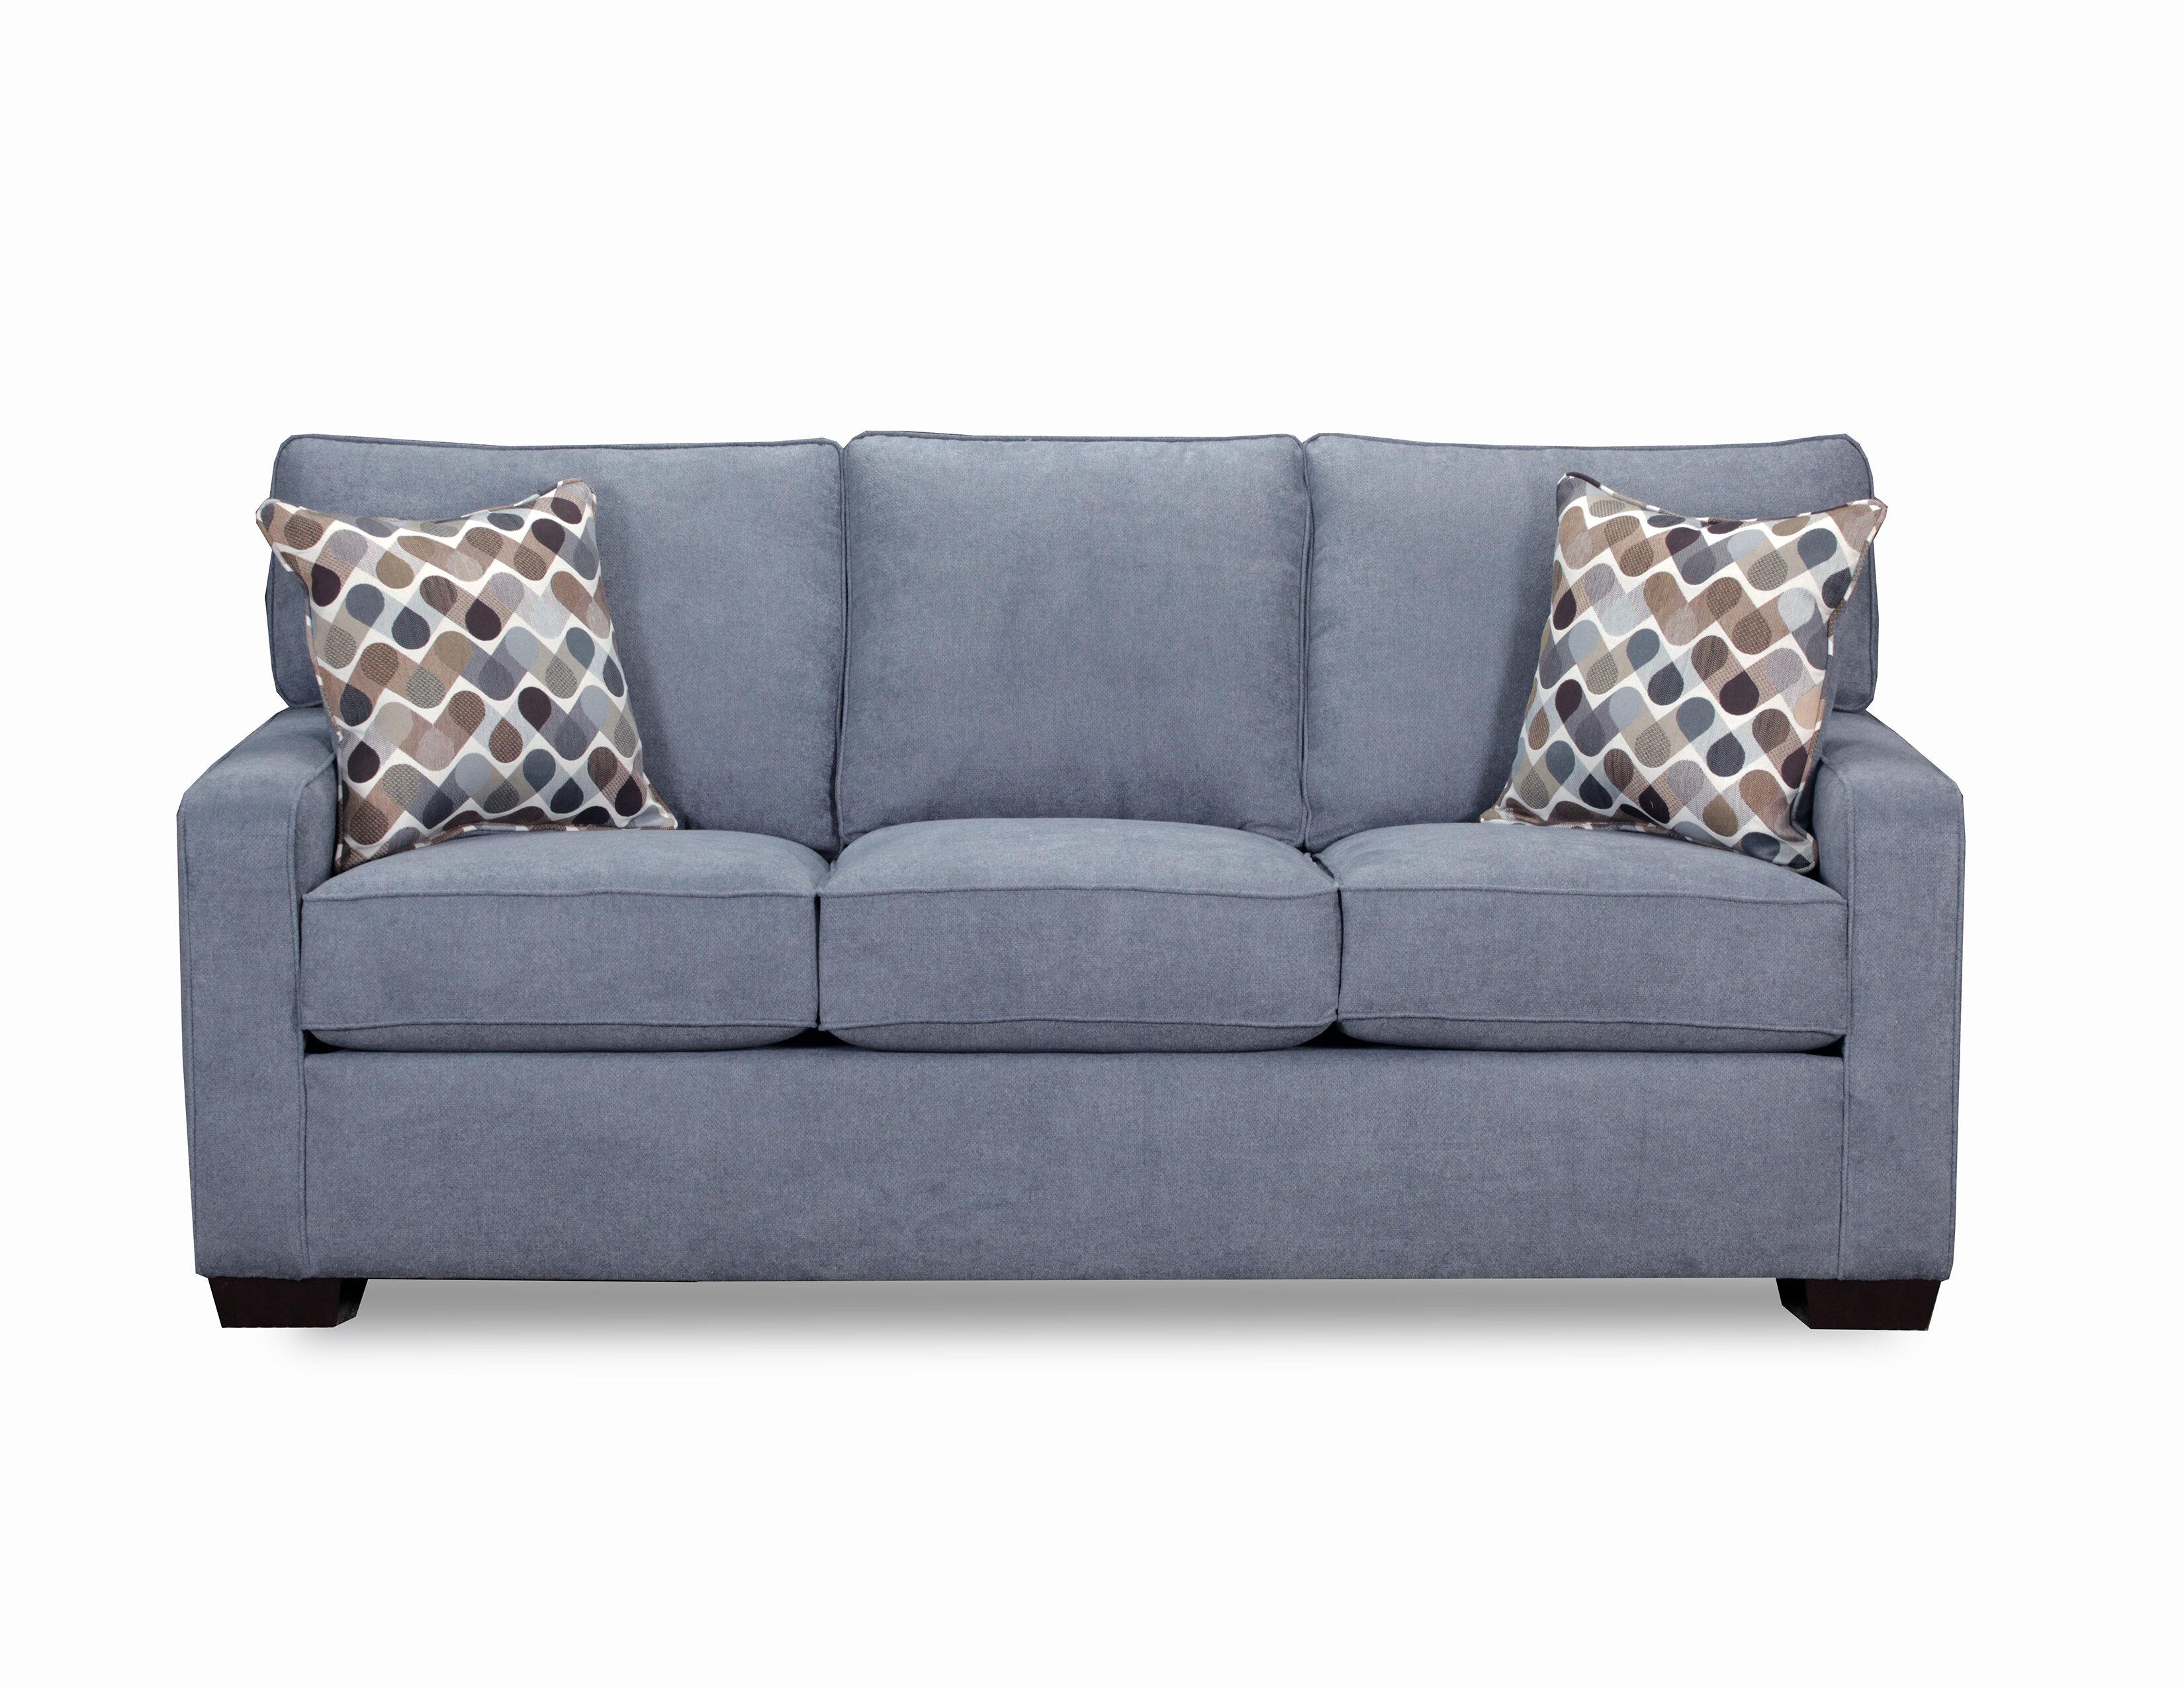 Red Barrel Studio Janita Sleeper Sofa